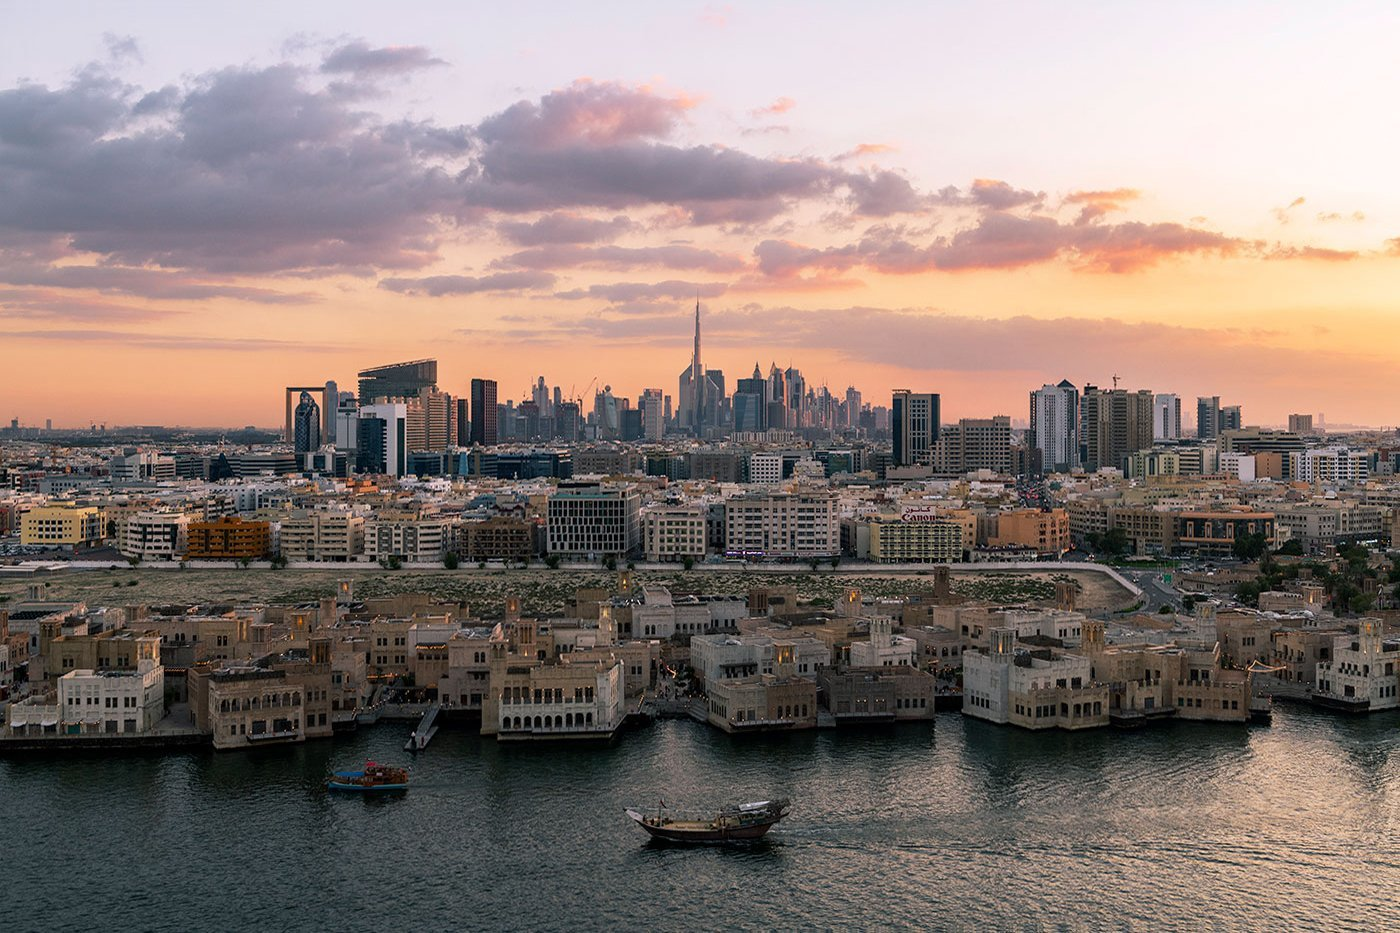 Dubai creek and skyline during sunset